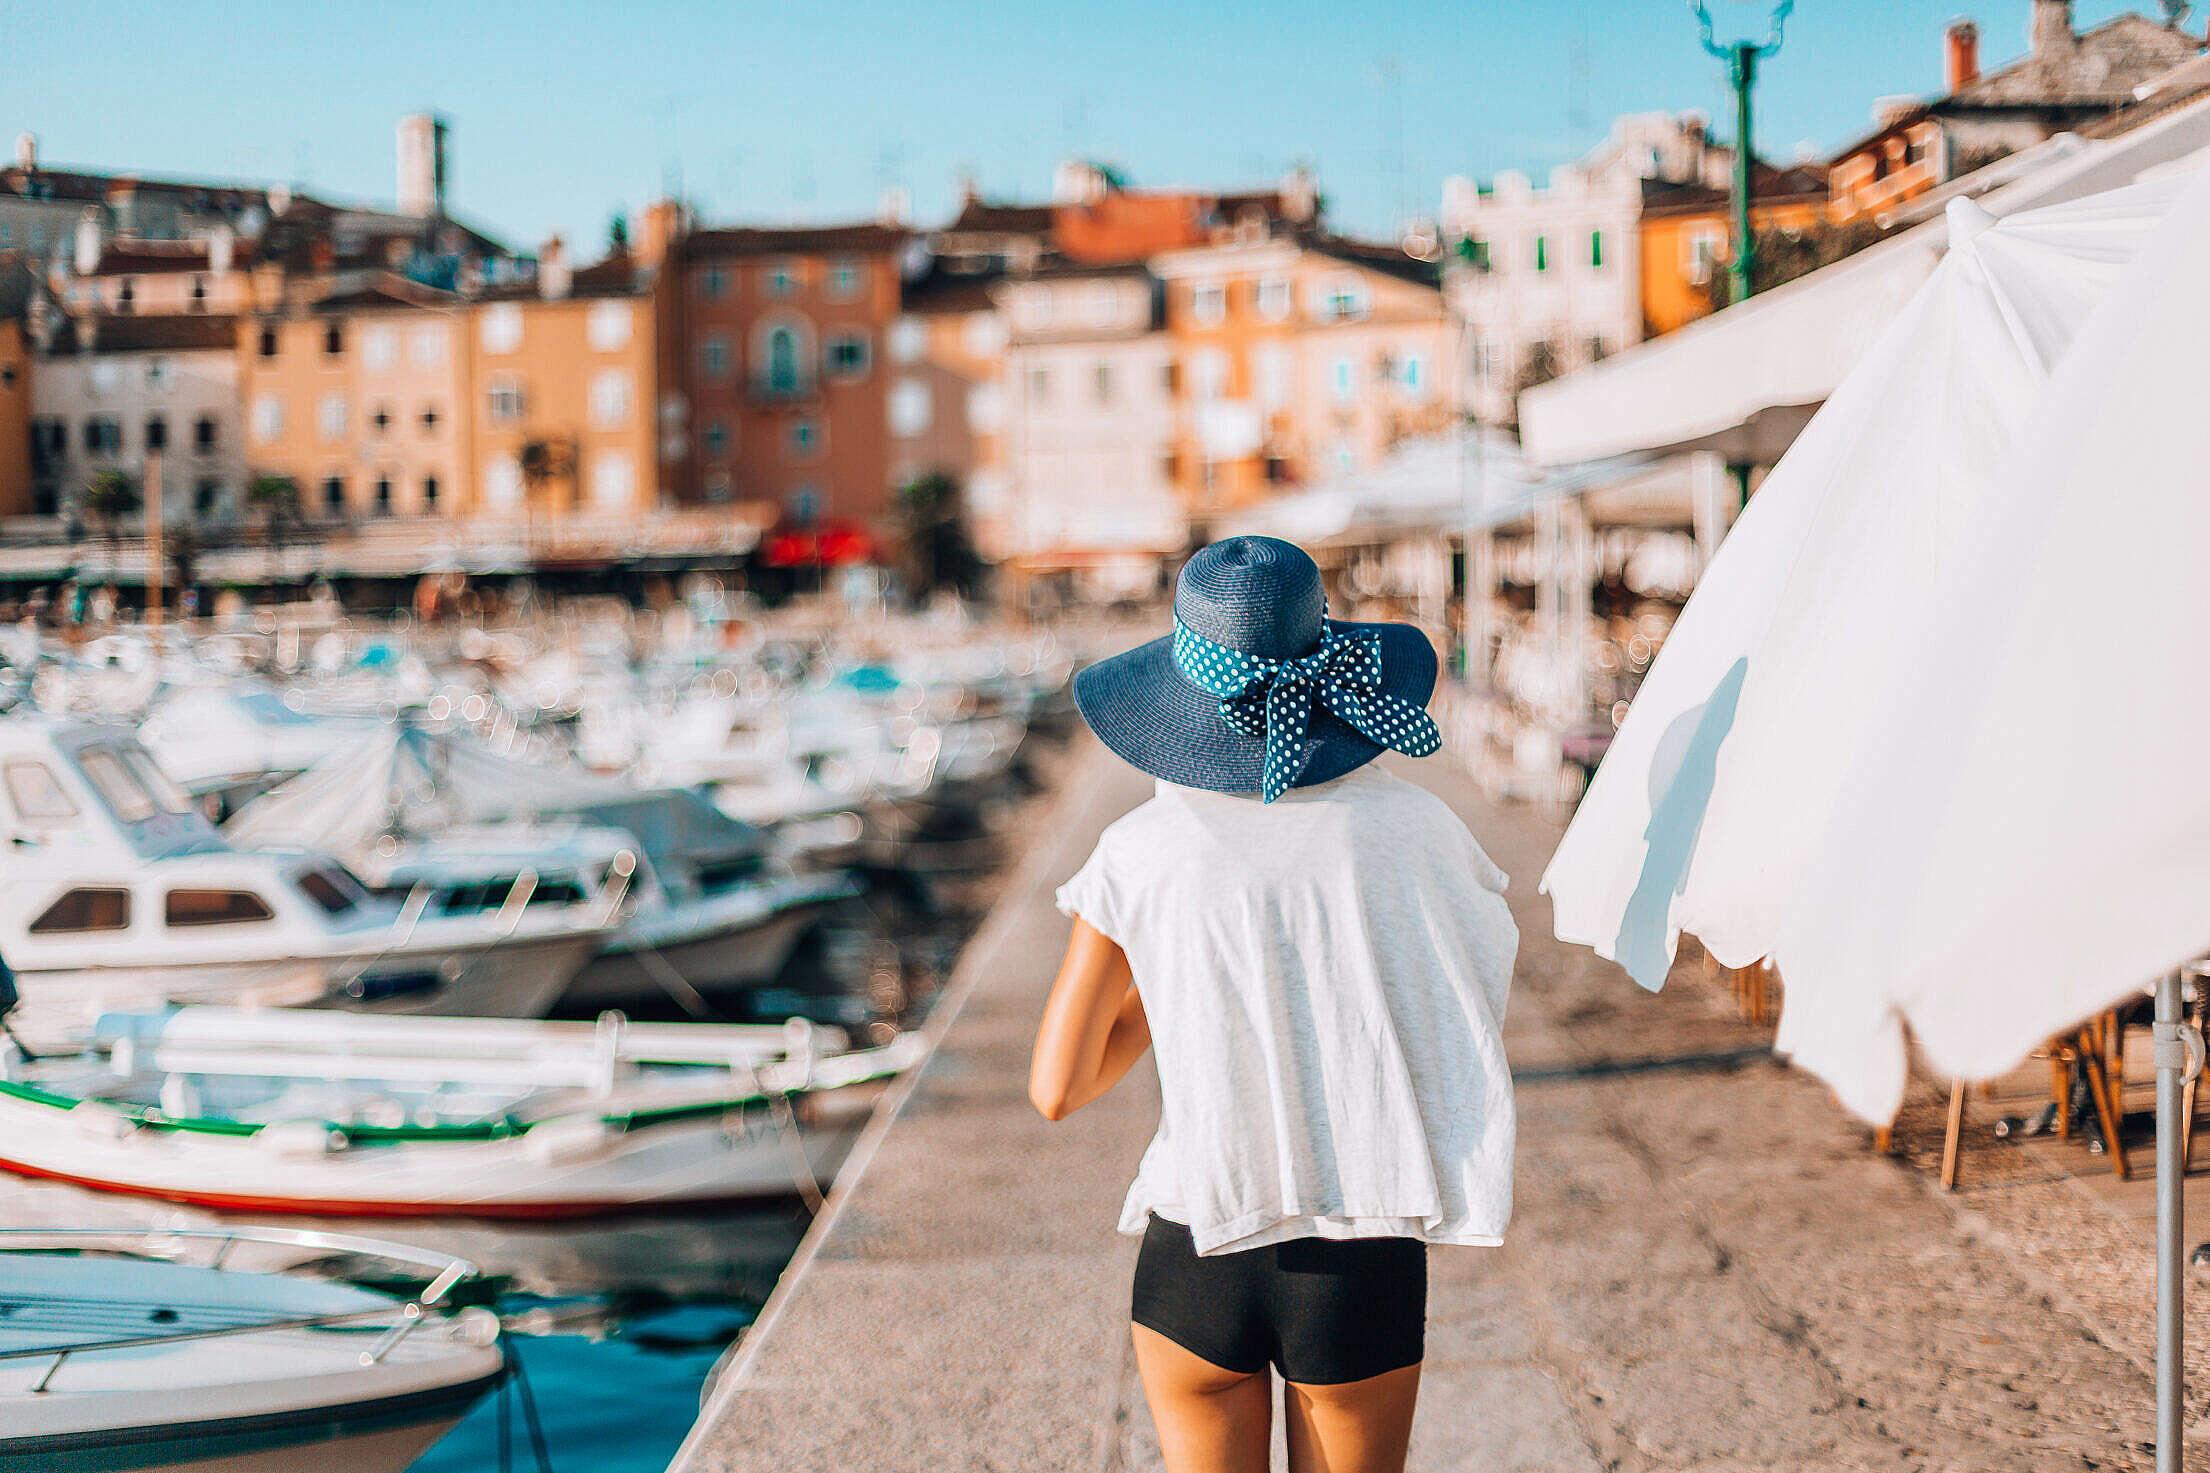 Young Woman Walking Around The Harbor in Croatia Free Stock Photo